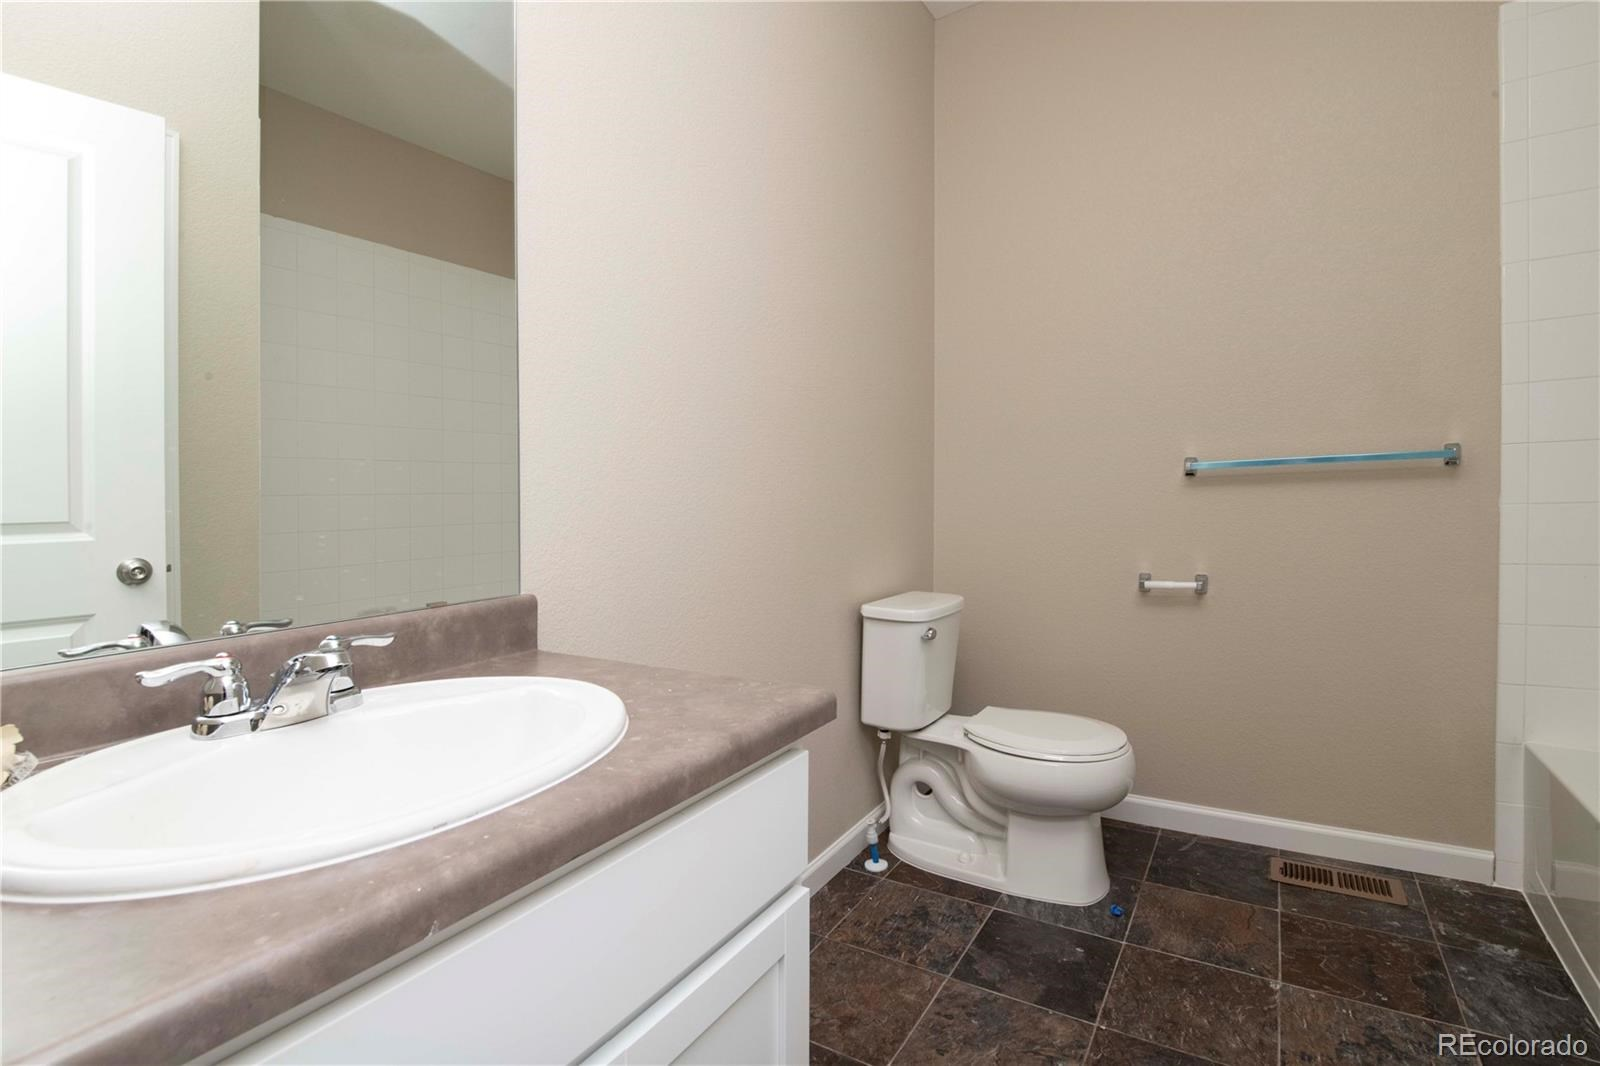 MLS# 4995334 - 13 - 2337 Saddle Back Court, Fort Lupton, CO 80621